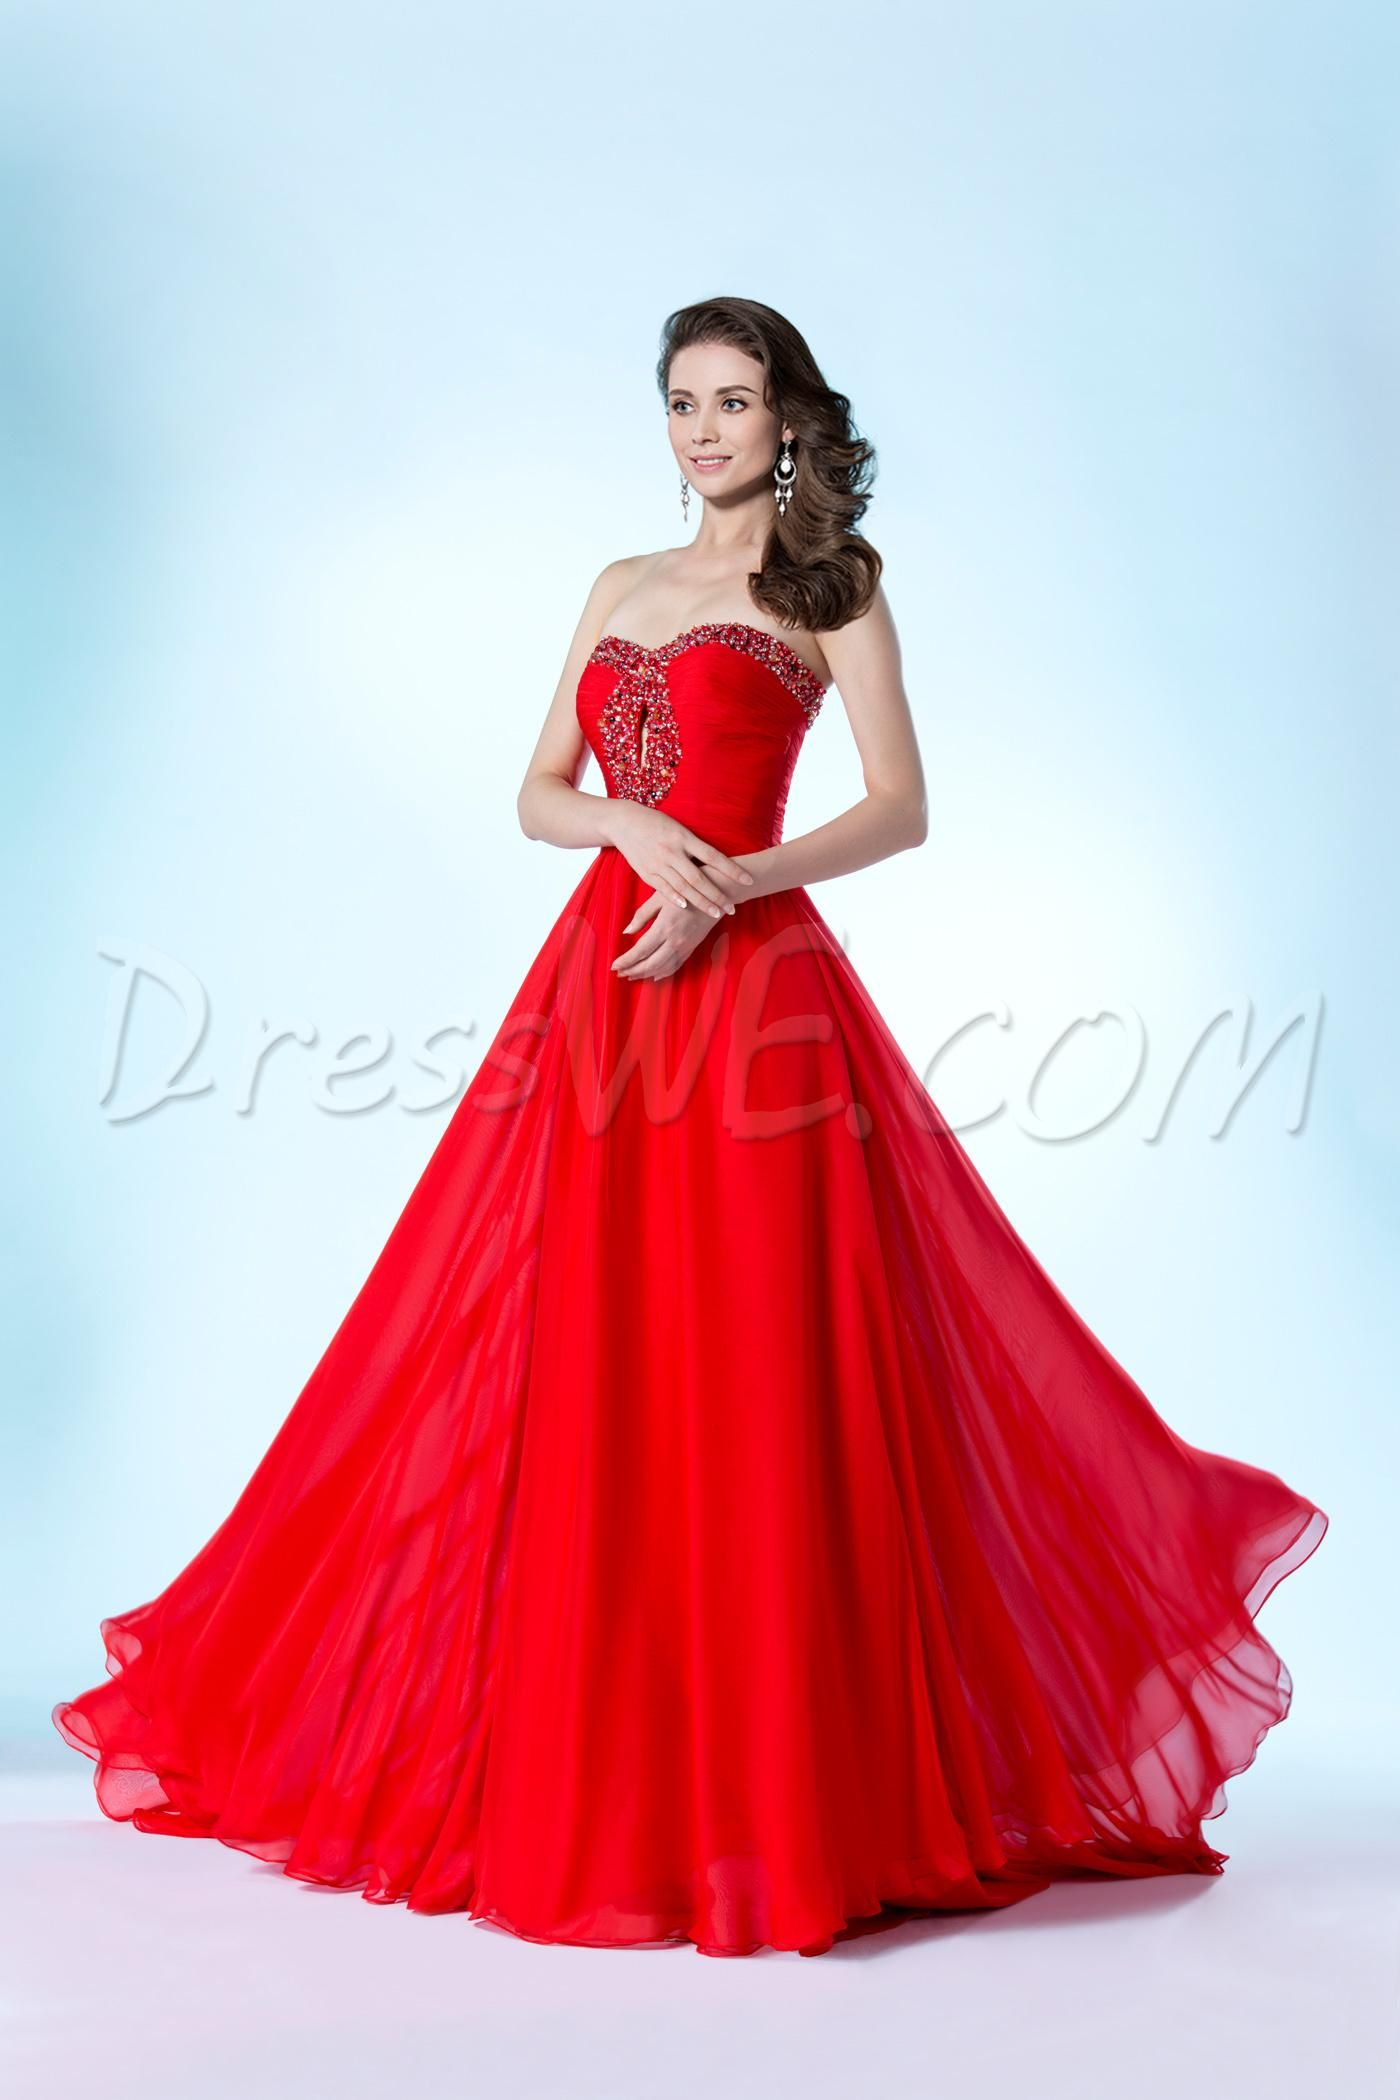 Fancy Strapless Beading Sweetheart Neckline A-Line Sweep/Brush Evening/Prom Dress 10771112 - Evening Dresses 2014 - Dresswe.Com #cheap prom dresses #prom dresses for women